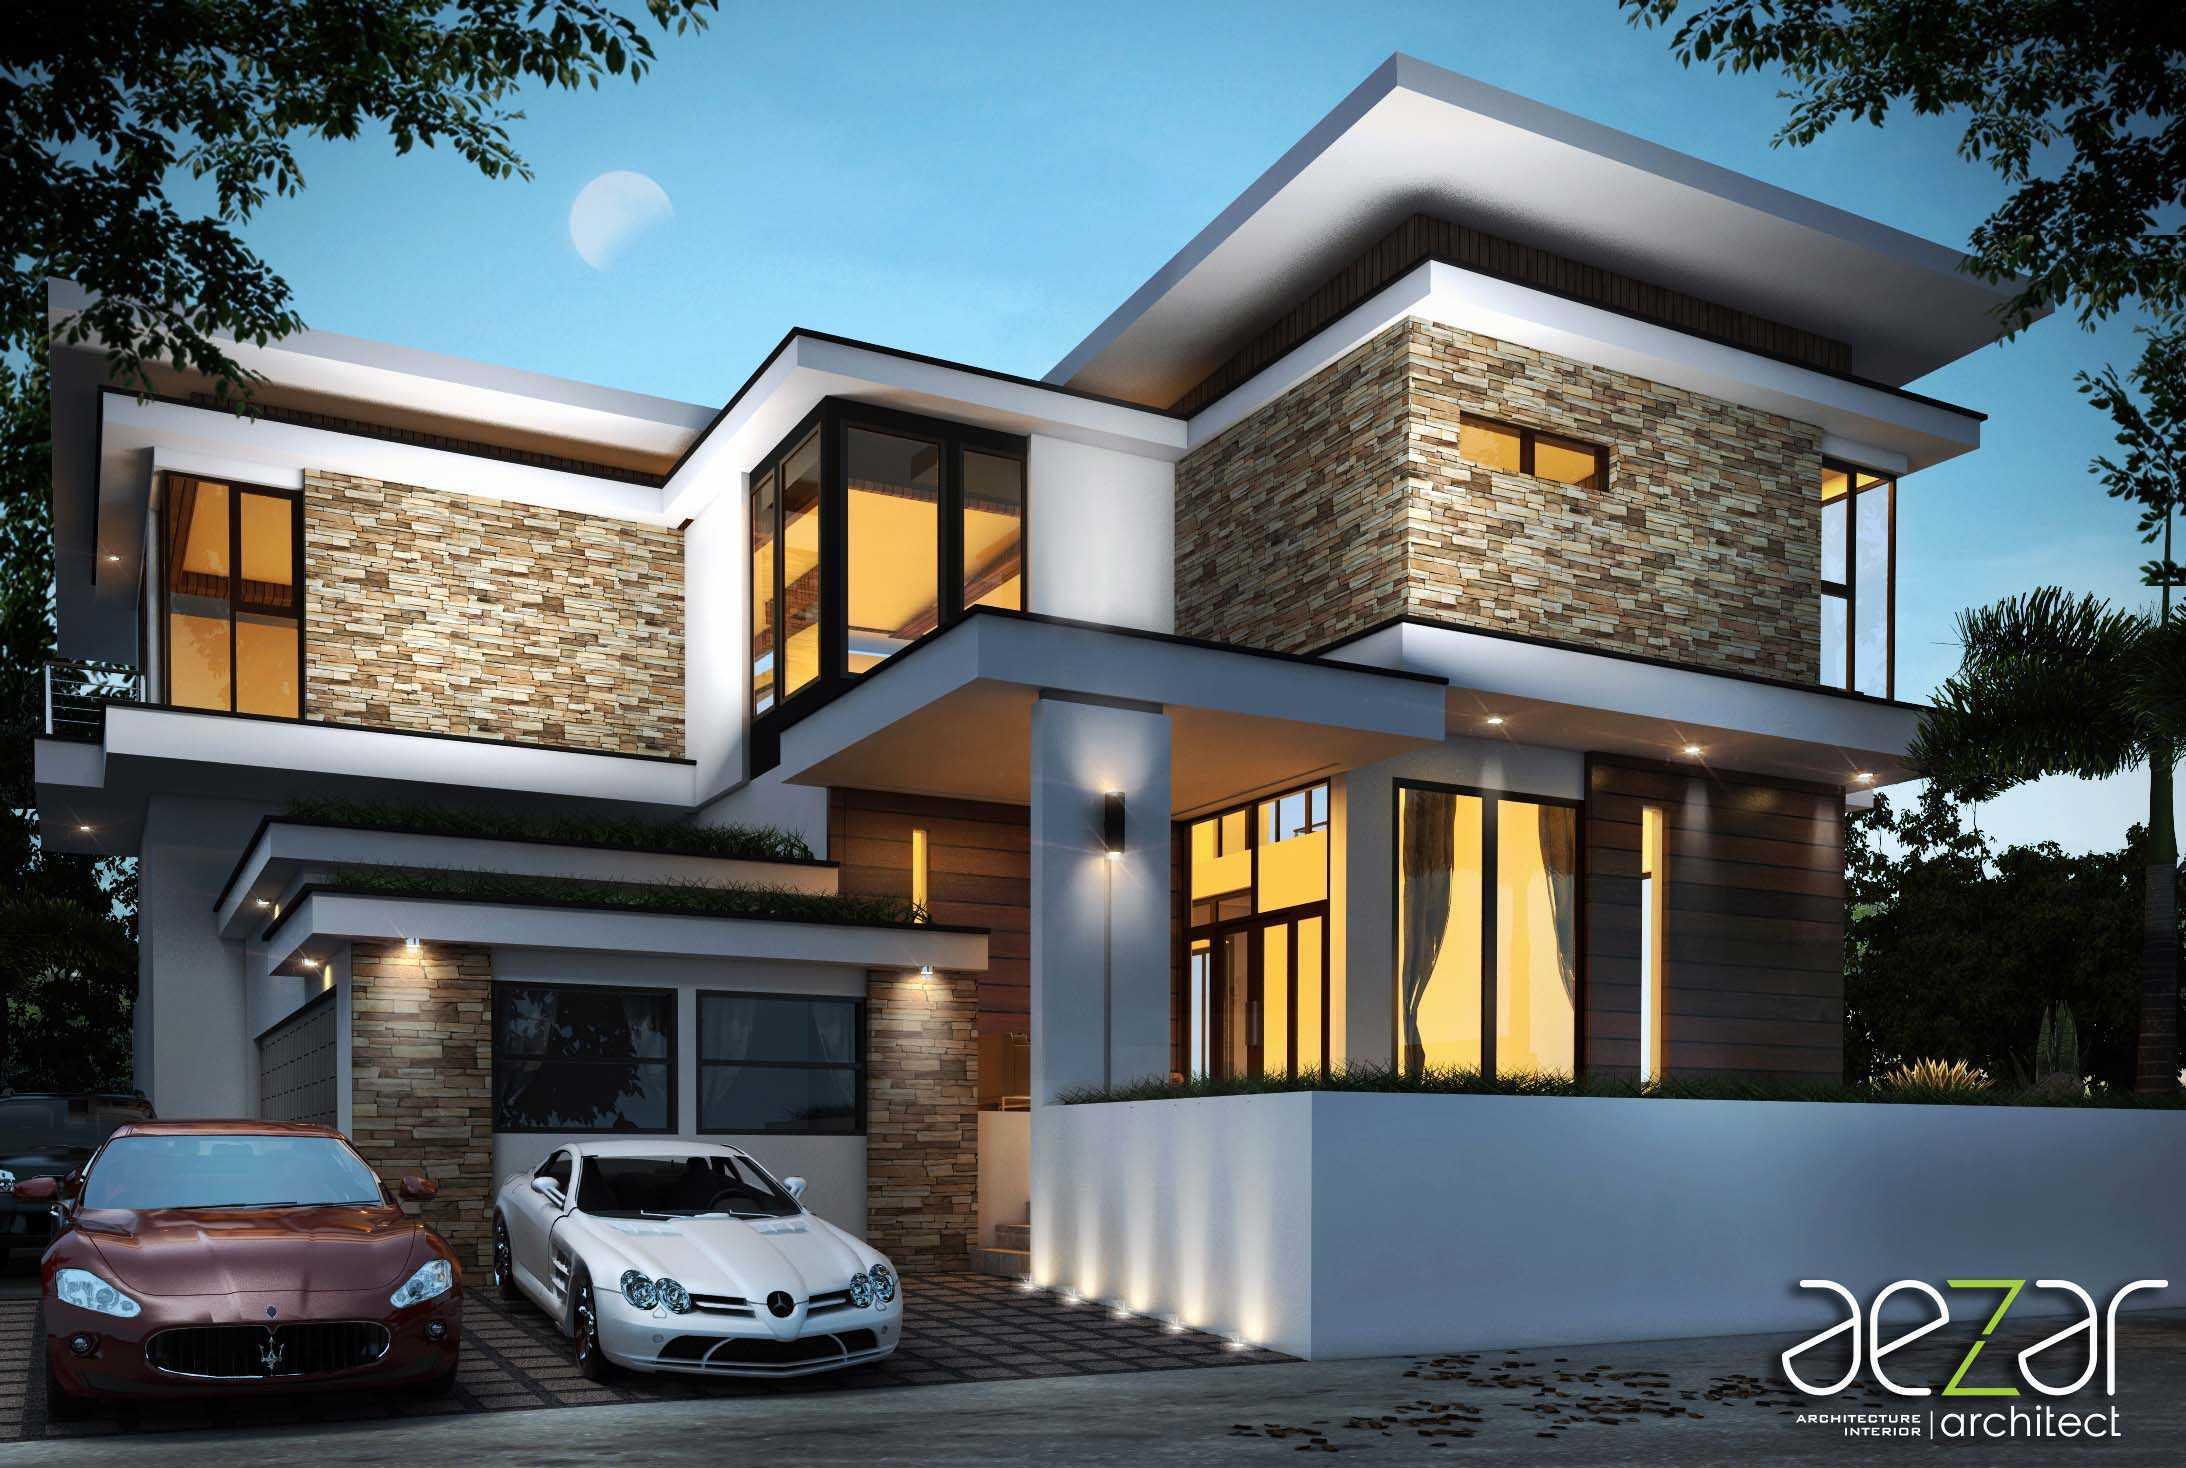 Aezar Architect Zk House Medan, Kota Medan, Sumatera Utara, Indonesia Medan, Kota Medan, Sumatera Utara, Indonesia Exterior View Contemporary  54457